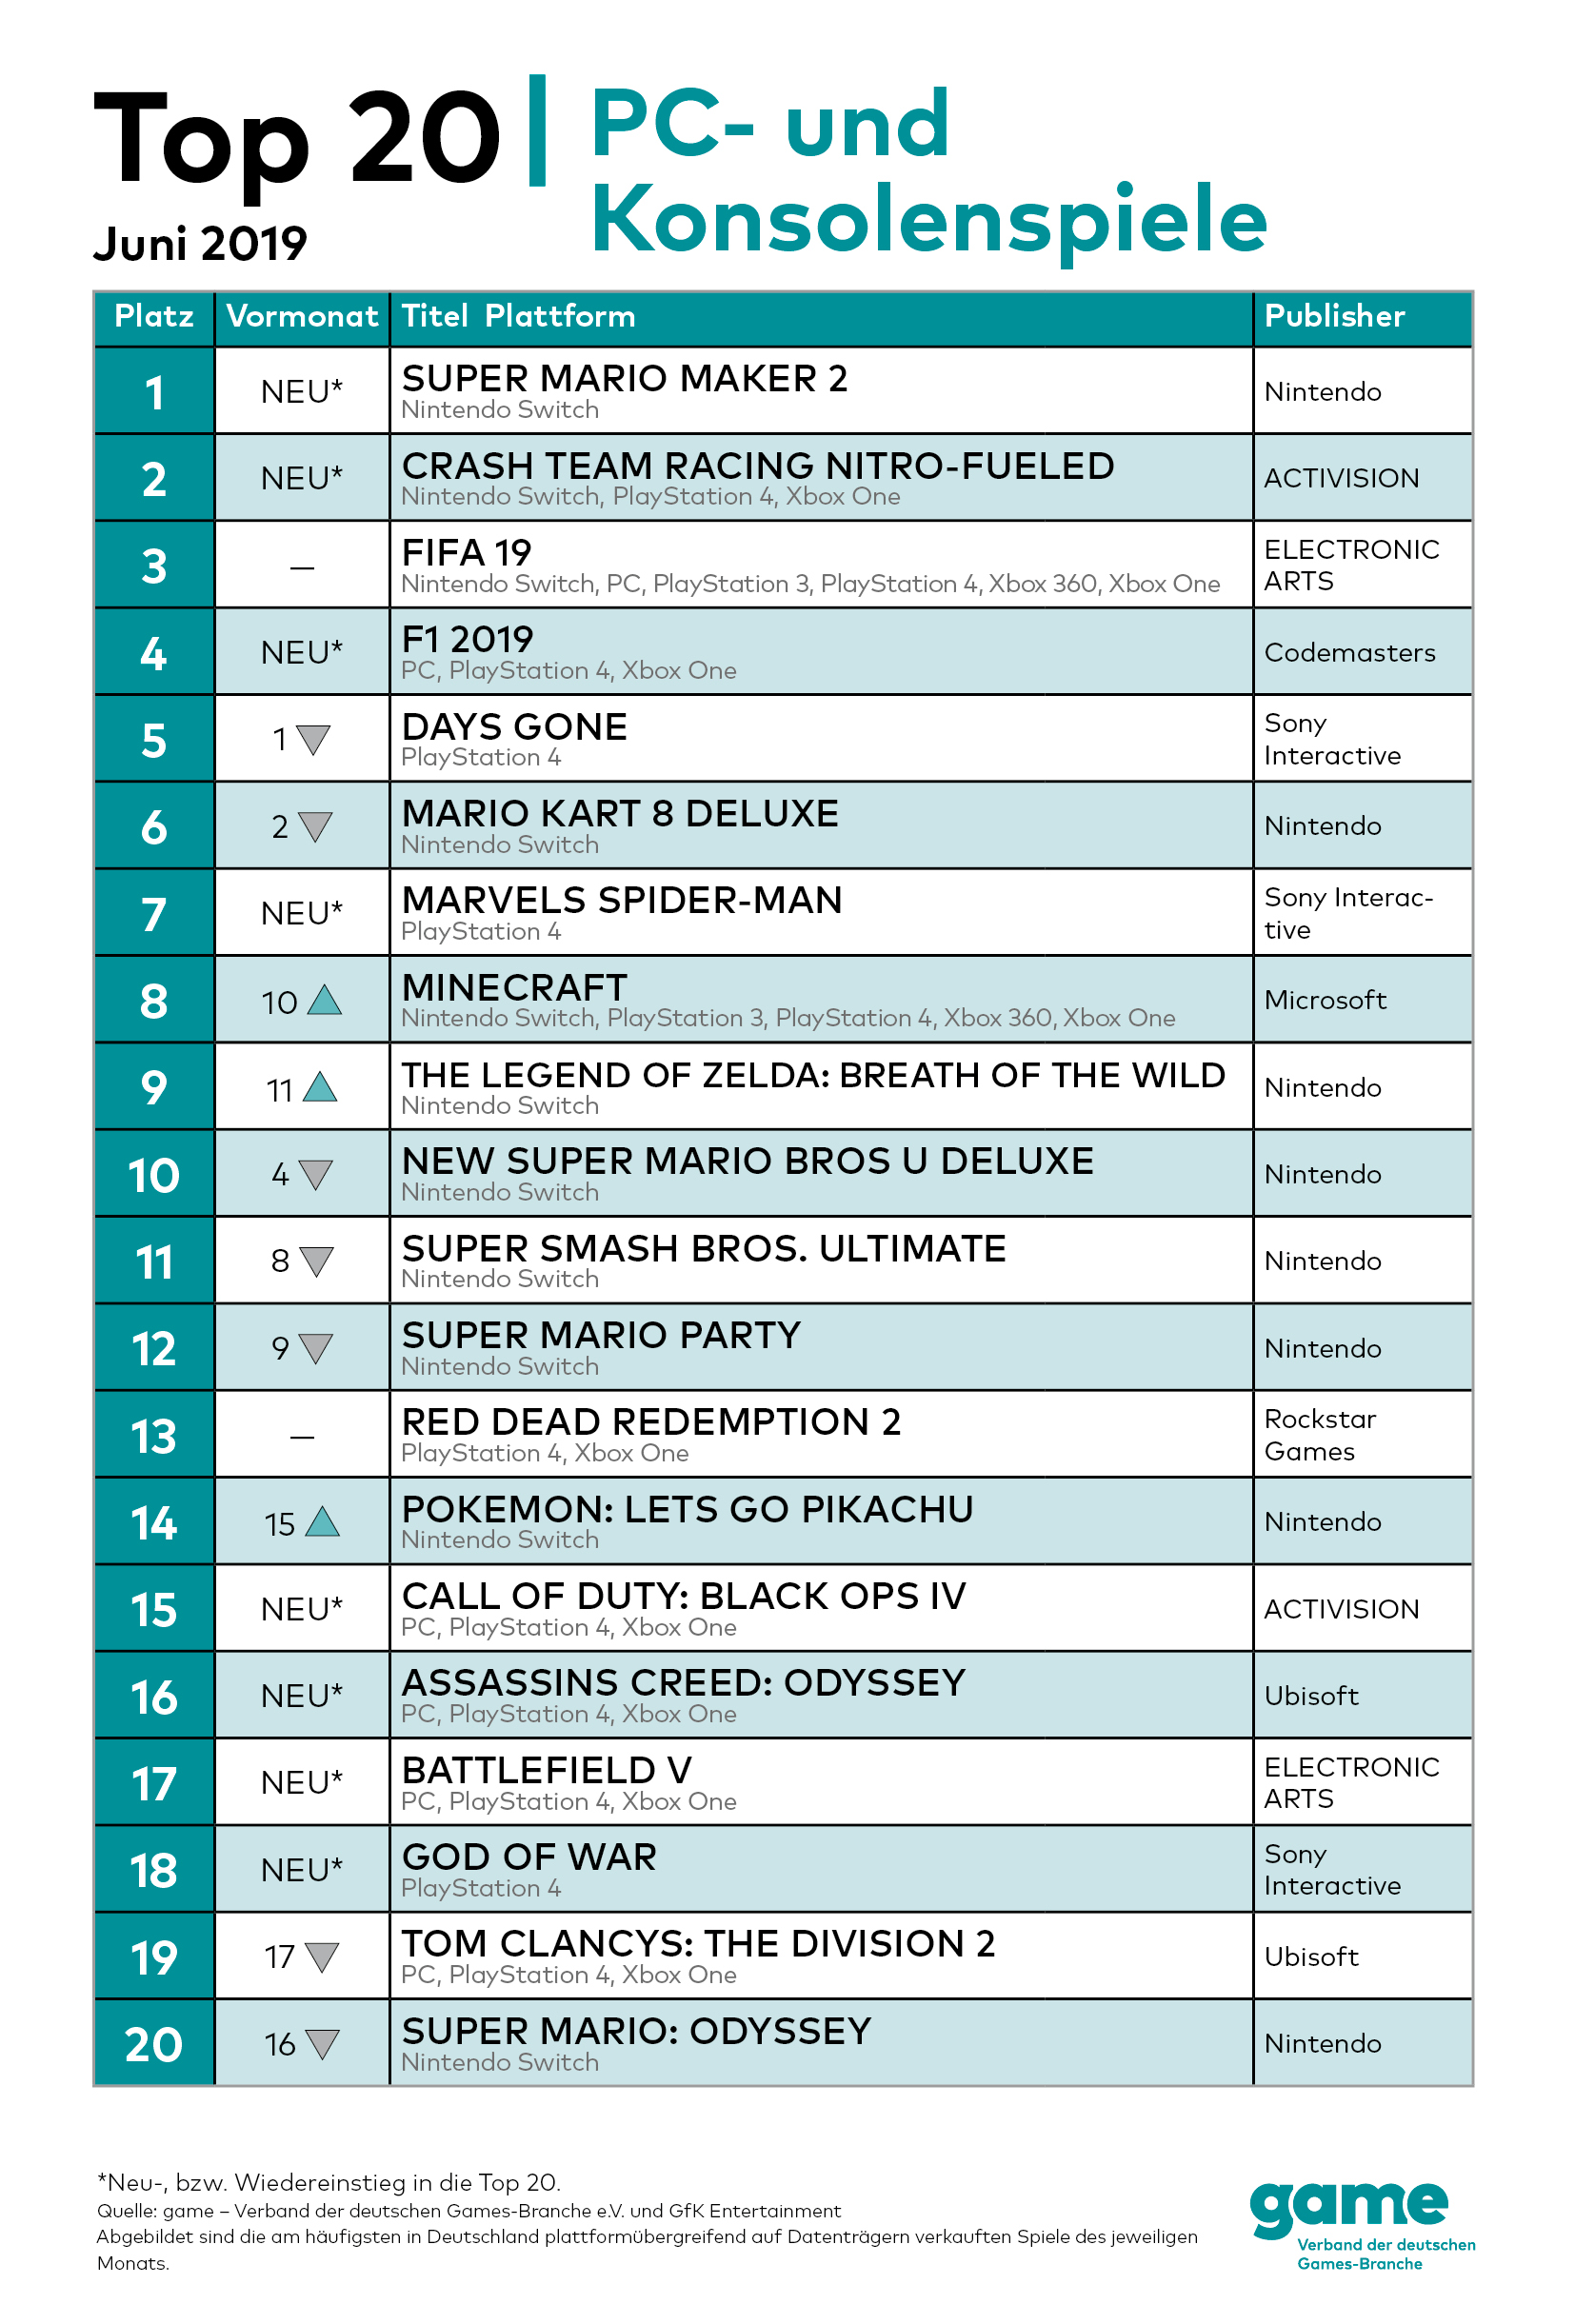 game_PC-Charts_Top20_Juni2019.jpg